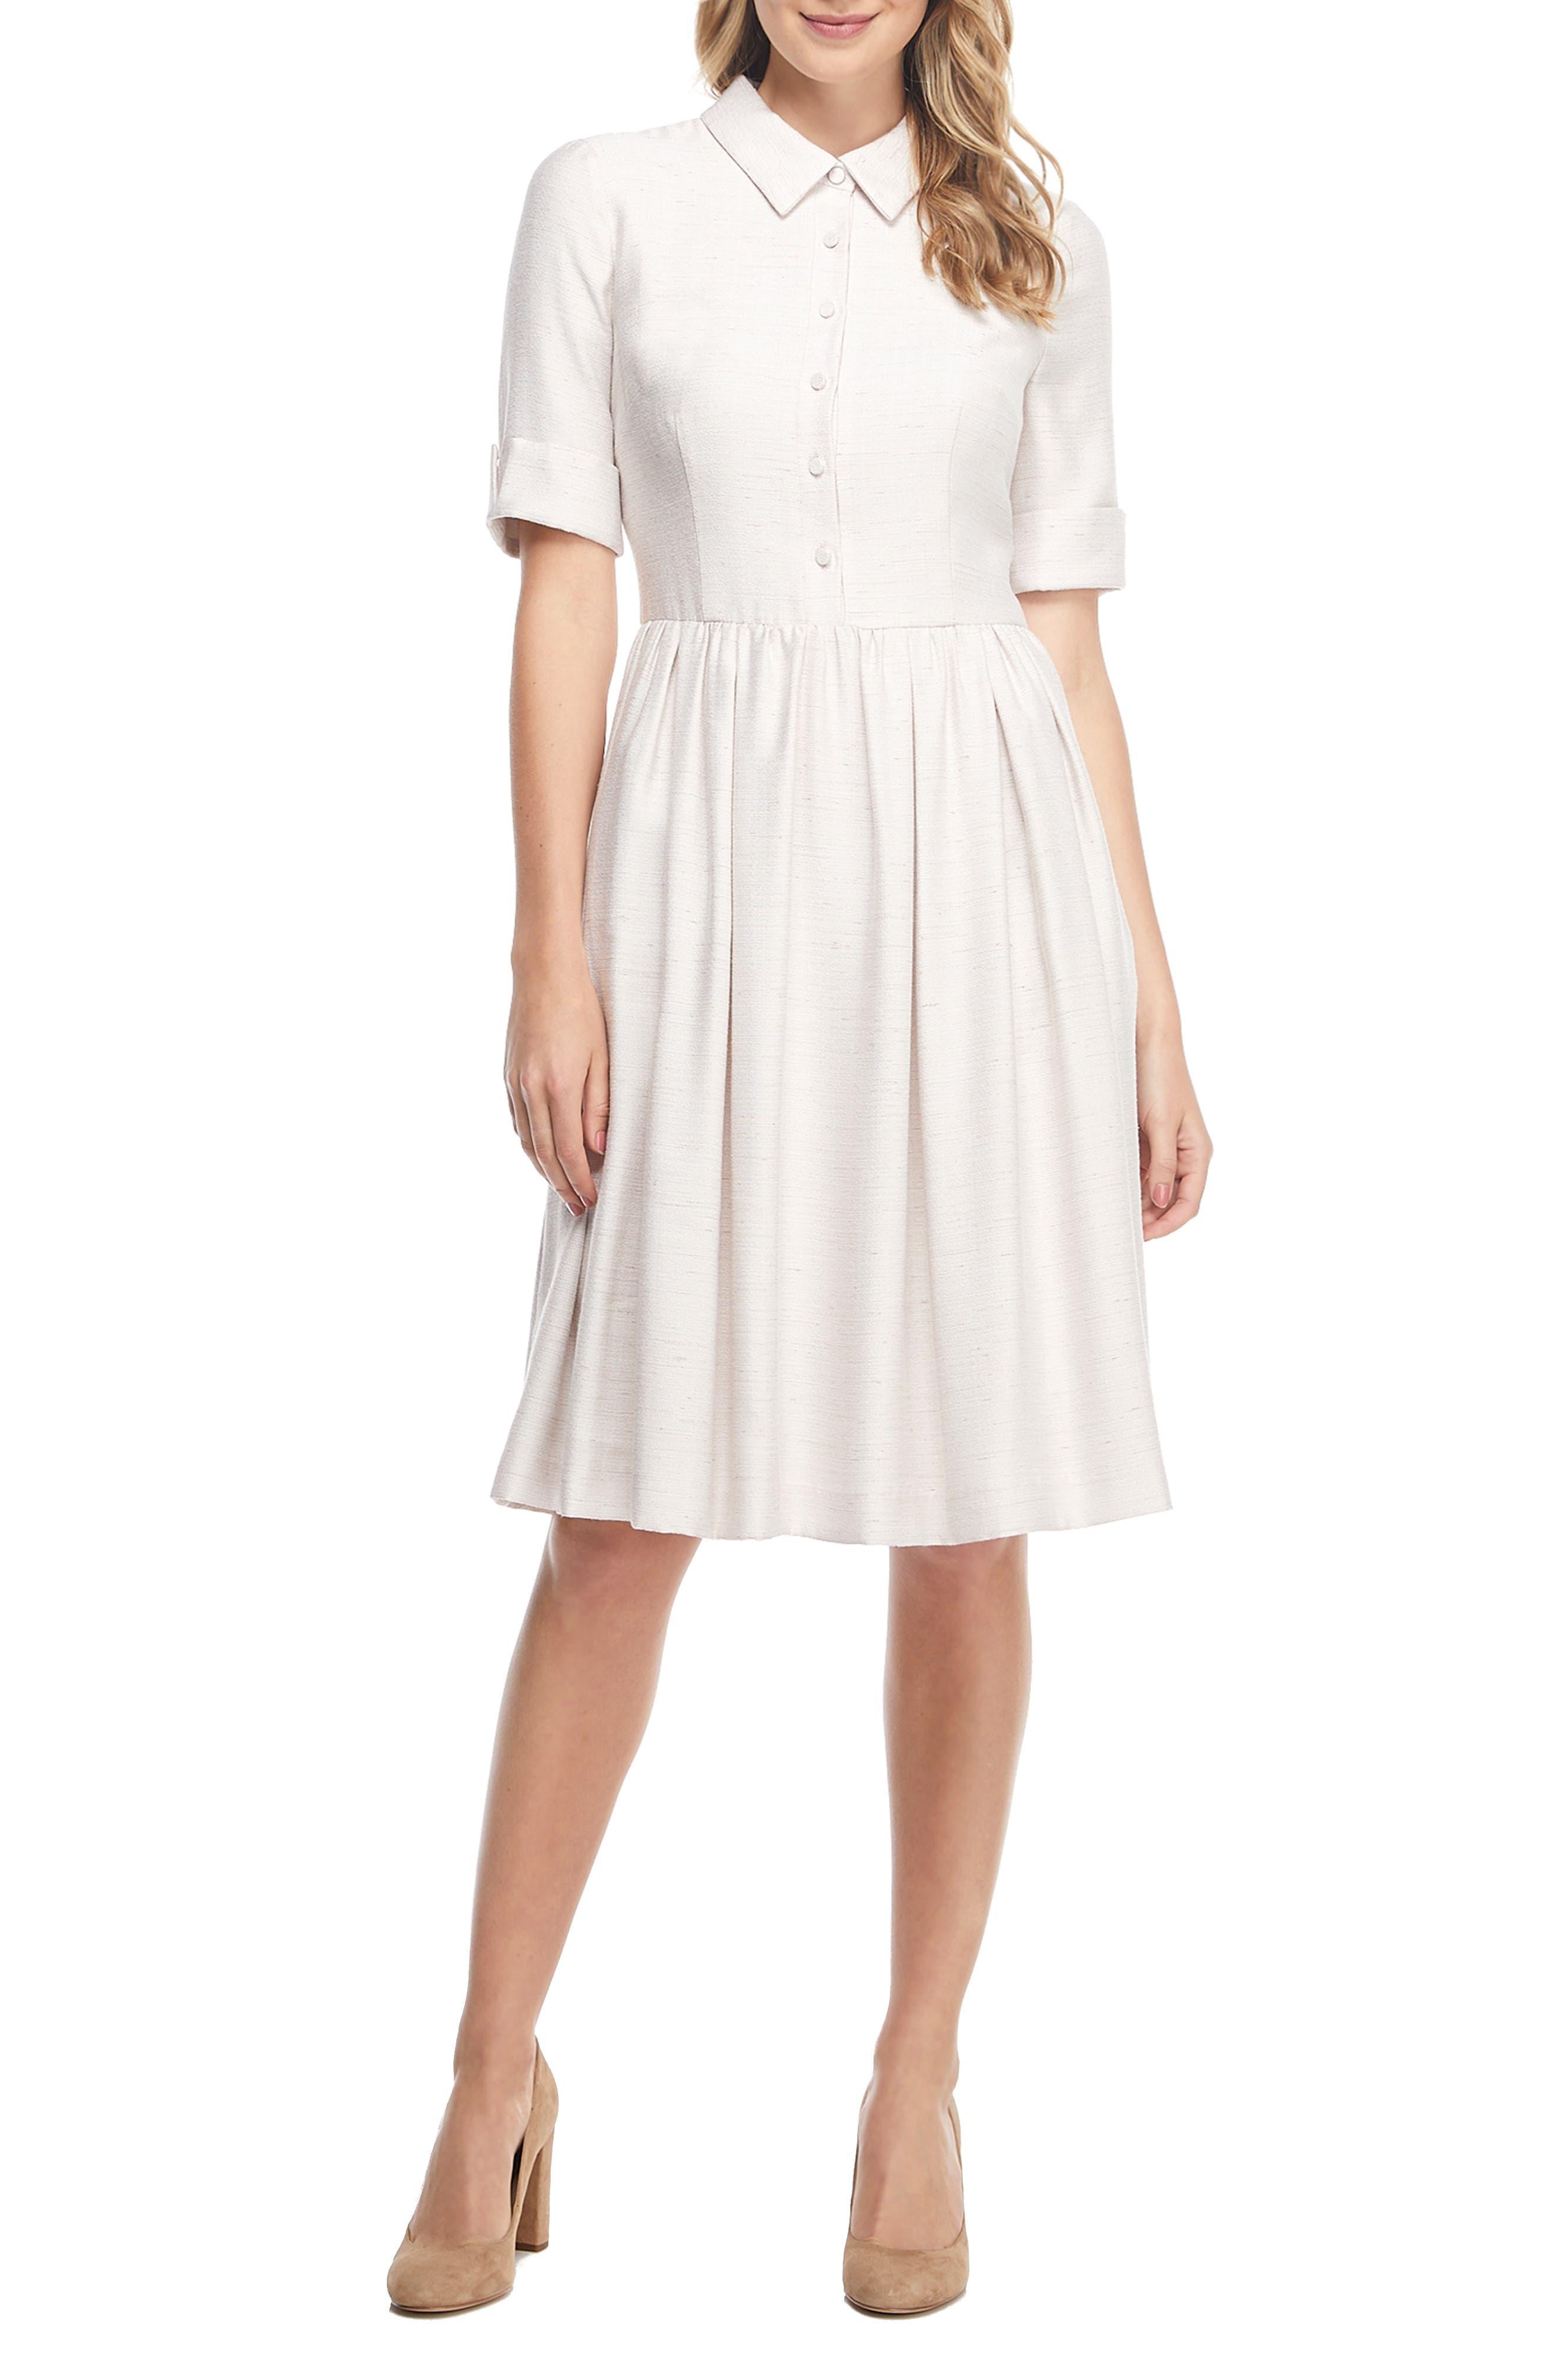 Plus Size Vintage Dresses, Plus Size Retro Dresses Womens Gal Meets Glam Collection Beatrice Tussah Textured Fit  Flare Dress $118.80 AT vintagedancer.com